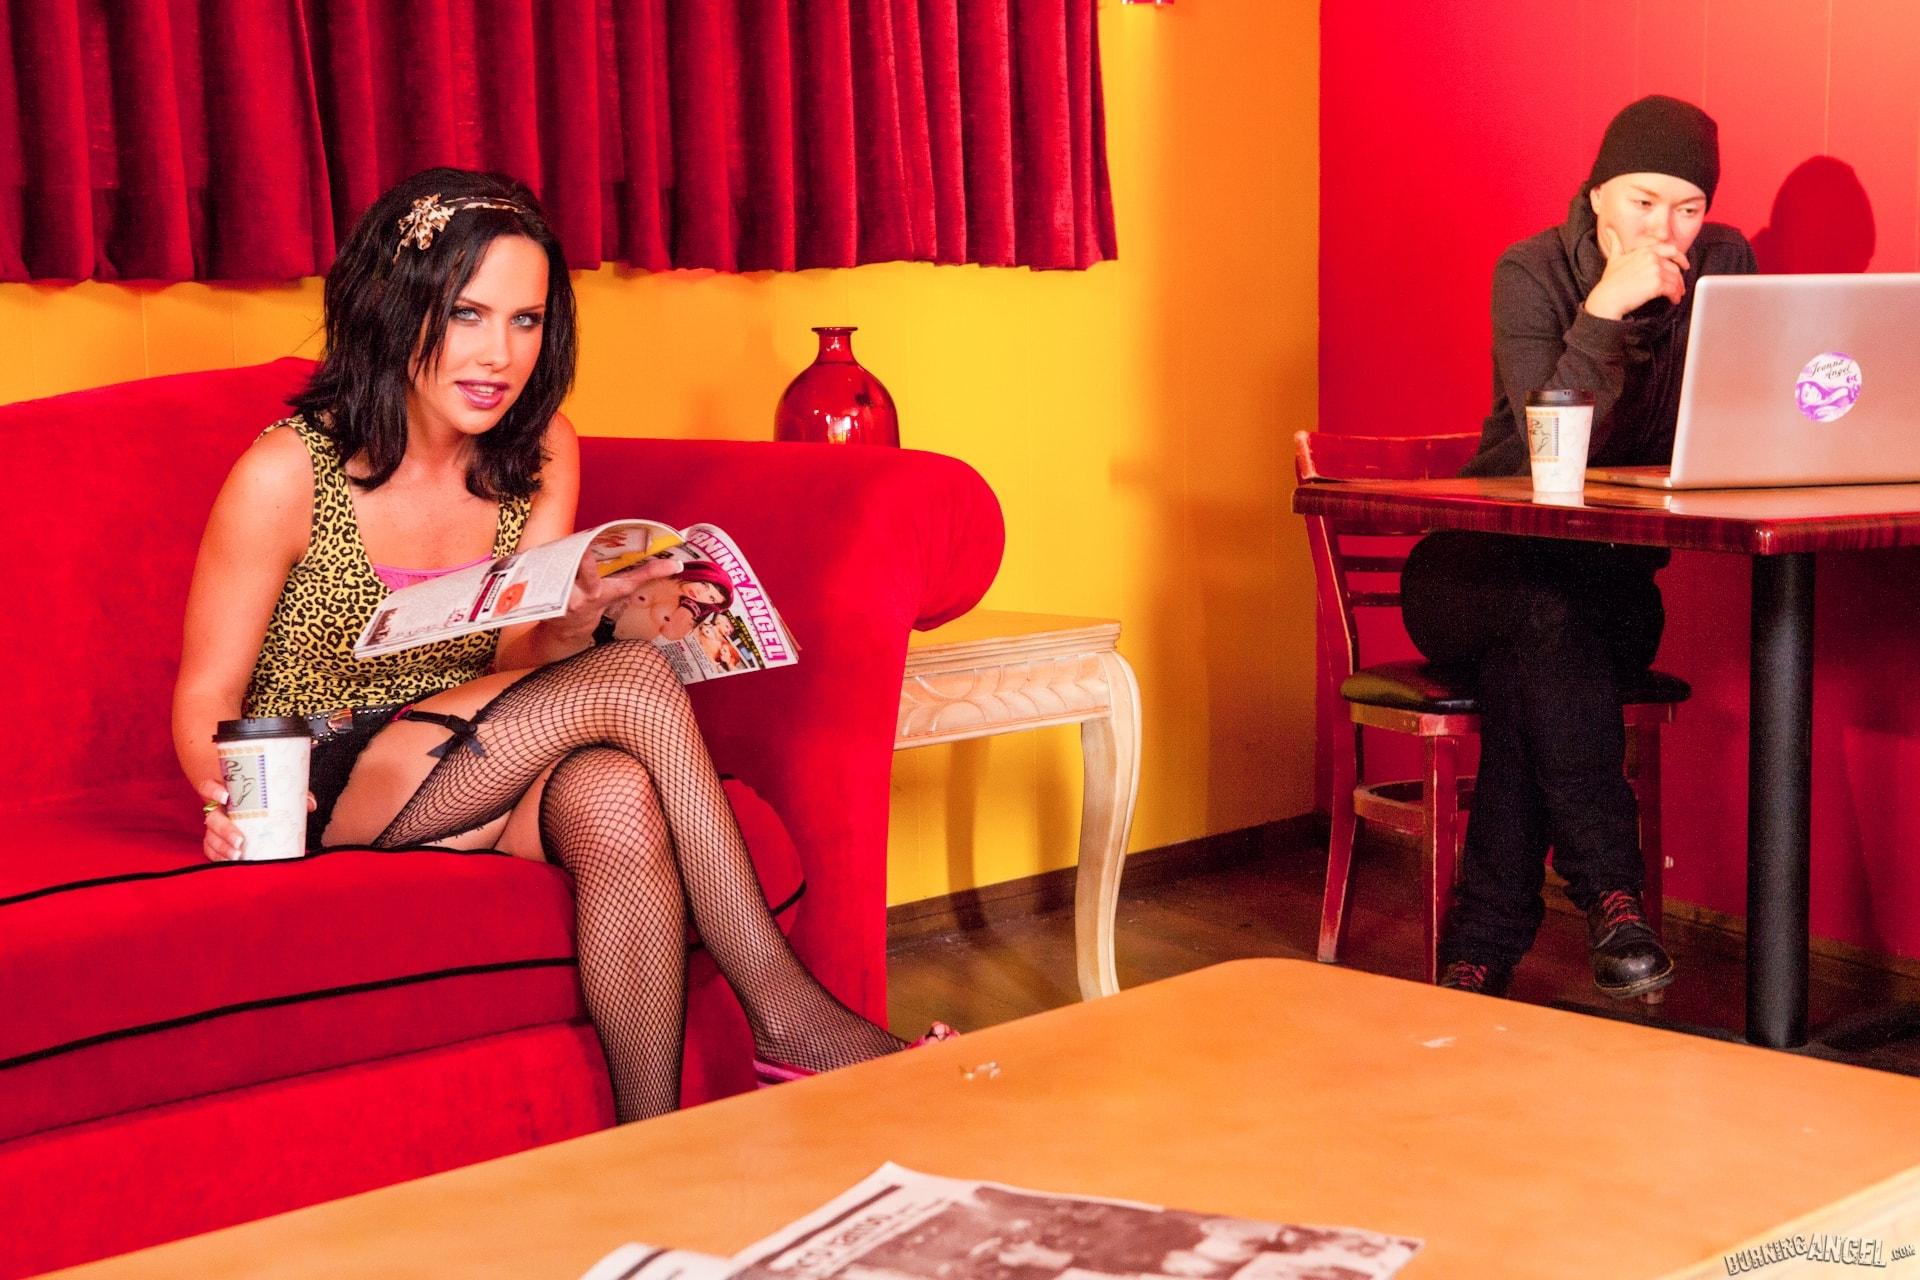 Burning Angel 'POV' starring Katie St. Ives (Photo 1)